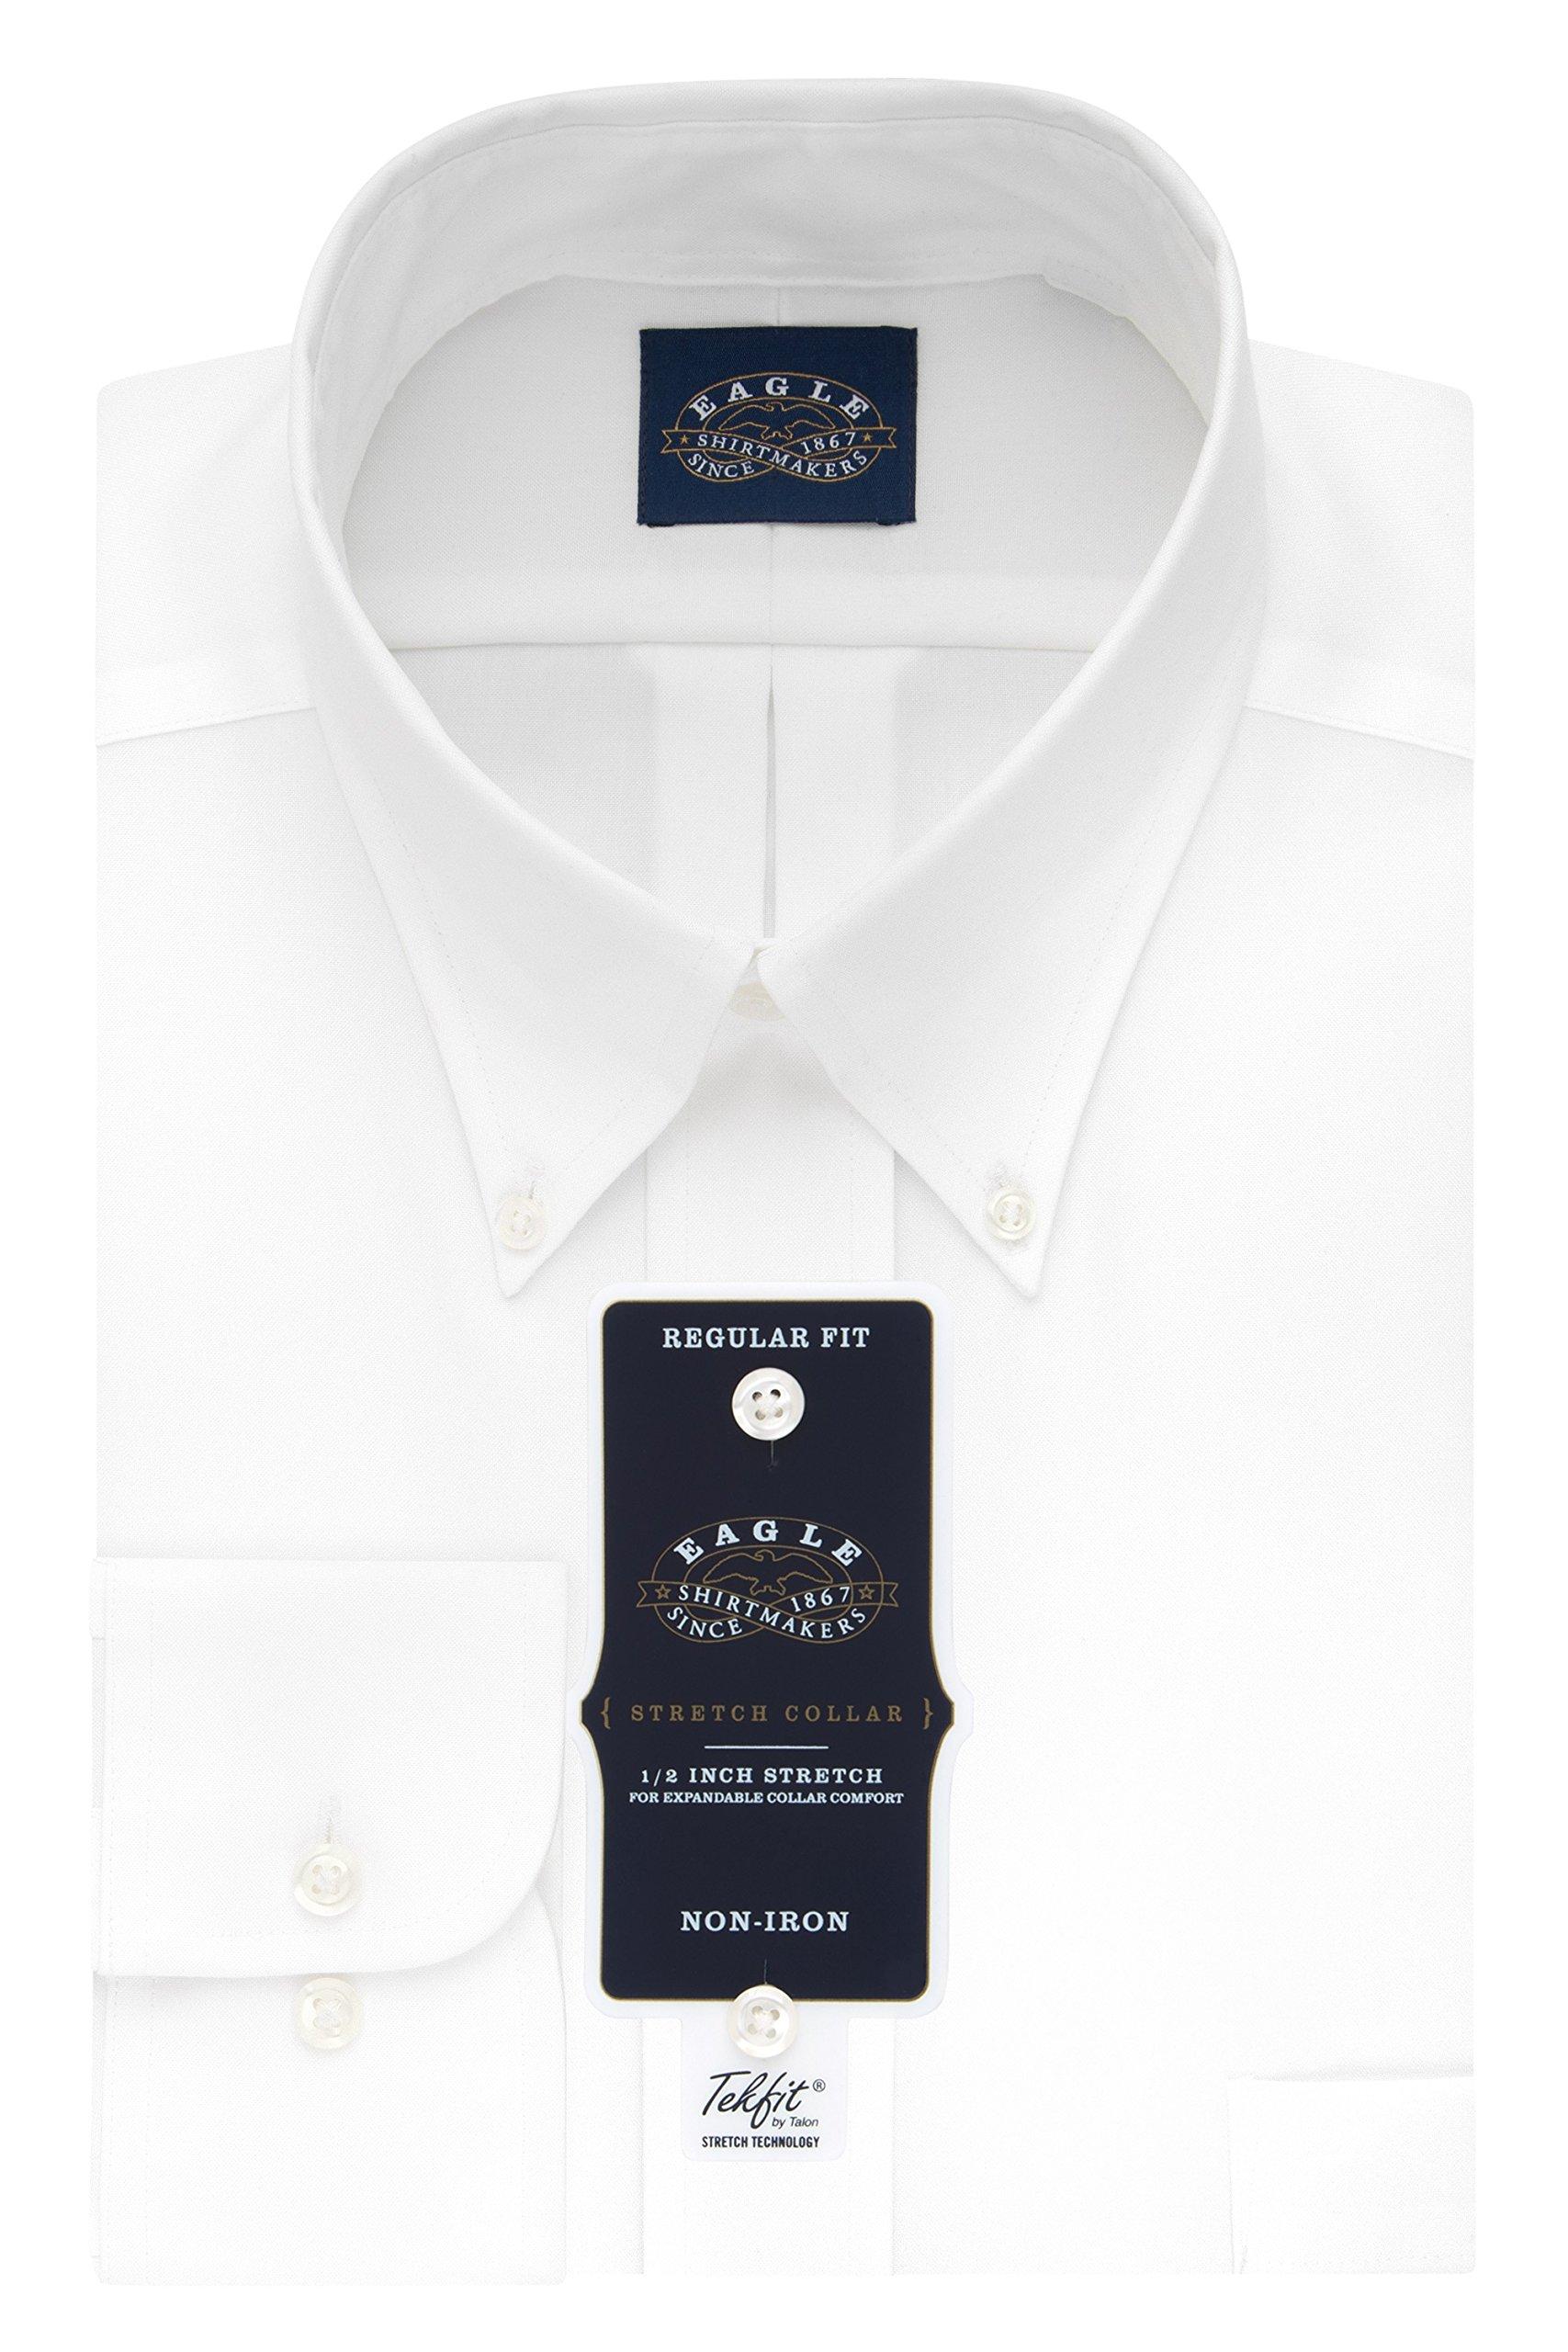 Eagle Men's Non Iron Stretch Collar Regular Fit Solid Buttondown Collar Dress Shirt, White, 17.5'' Neck 32''-33'' Sleeve